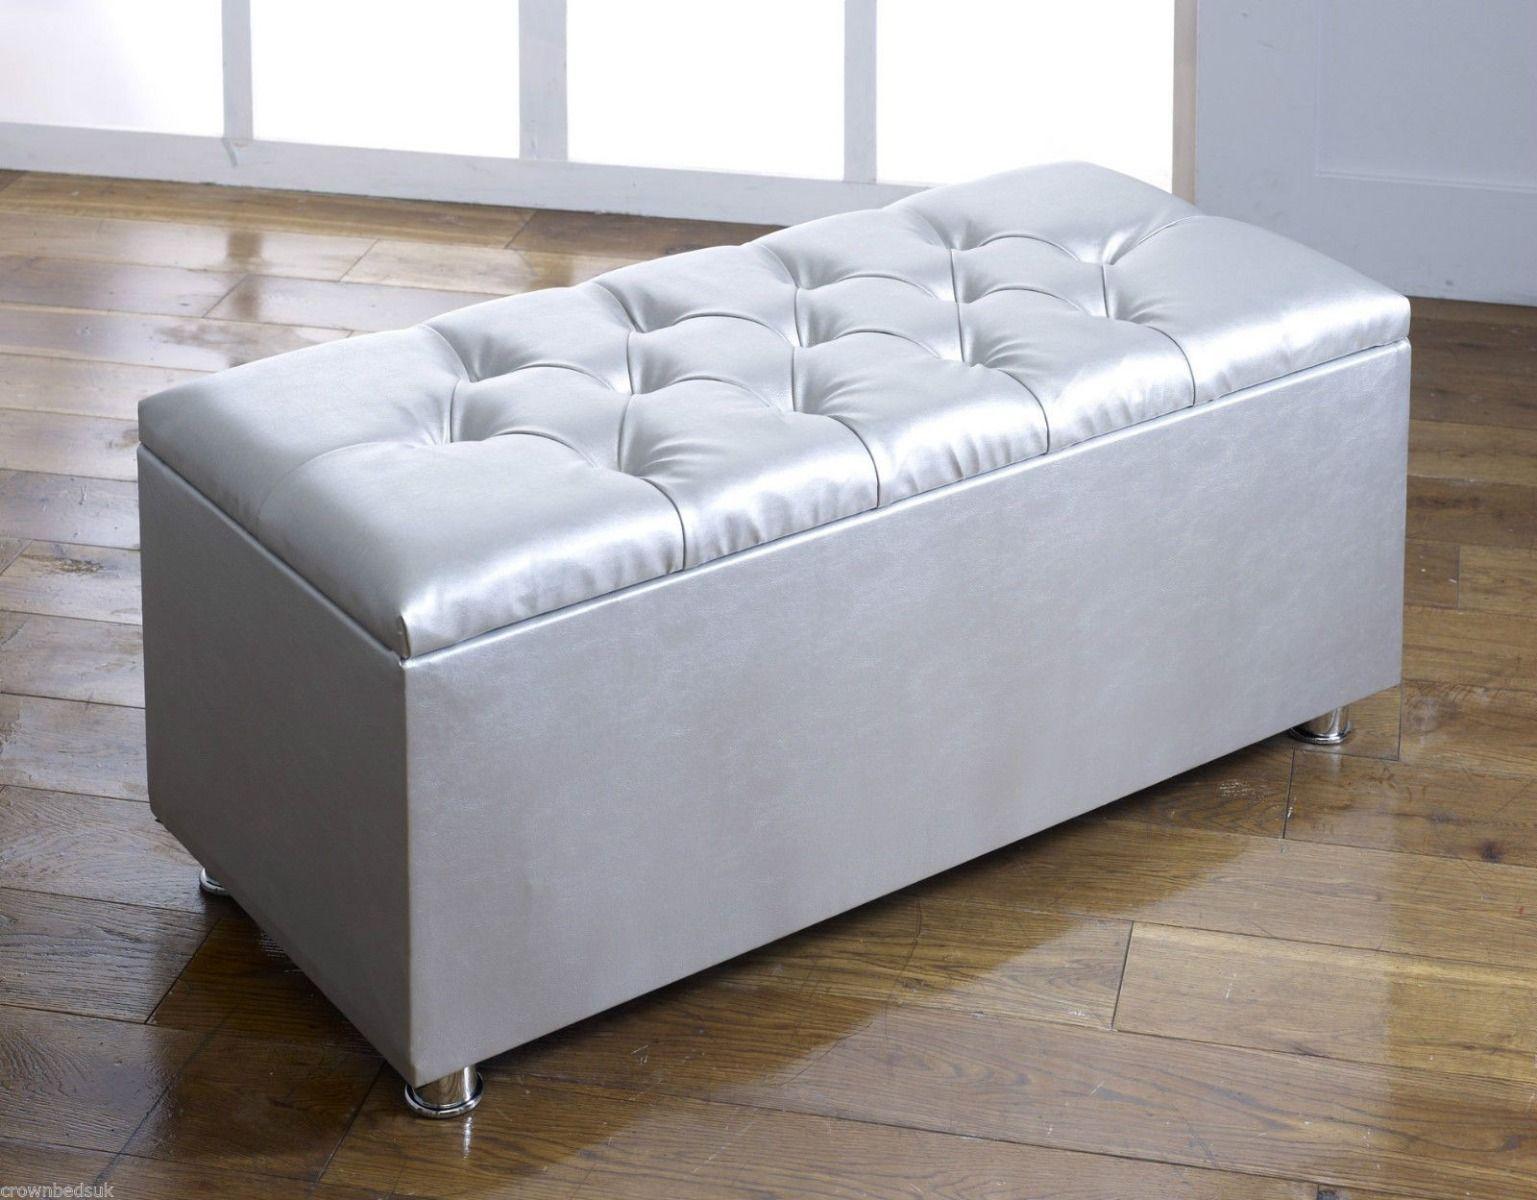 crown faux leather diamante ottoman toy storage blanket box silver